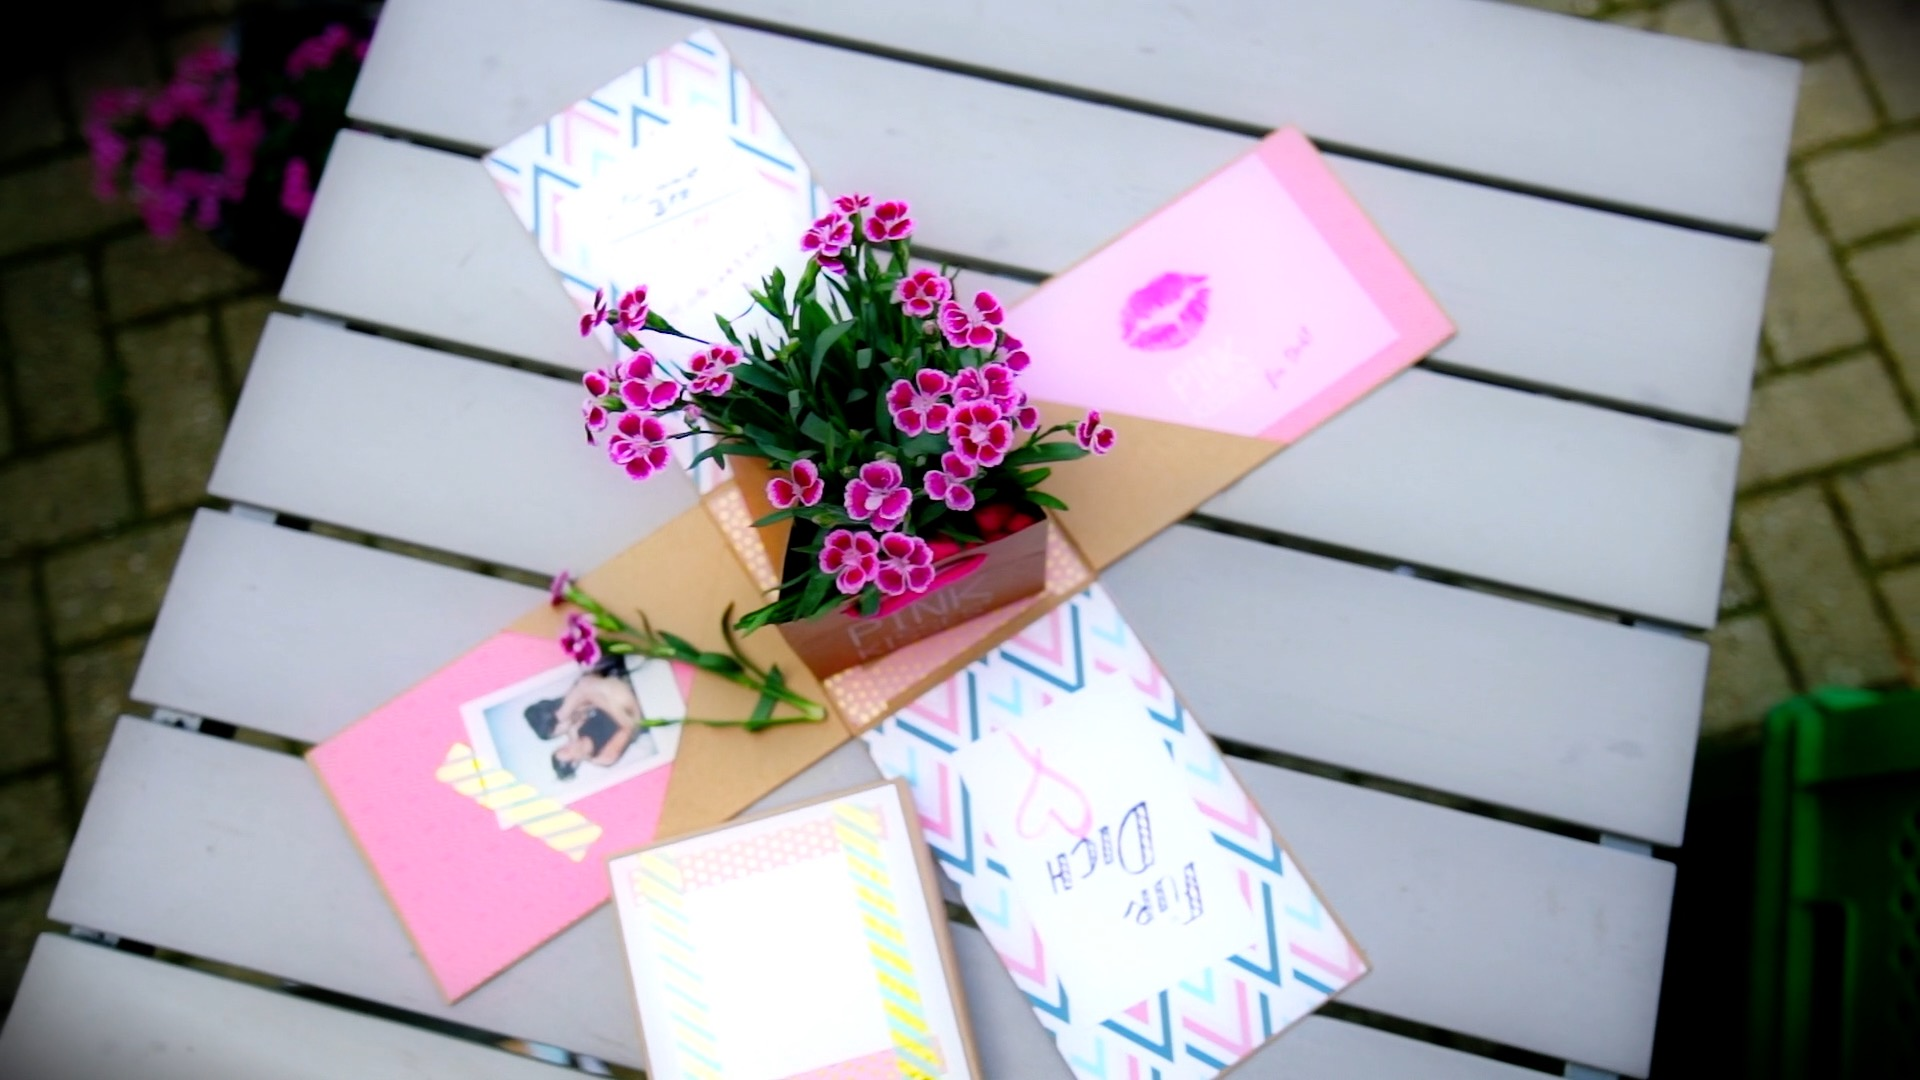 Offene Pop-Up-Box mit Pink Kisses